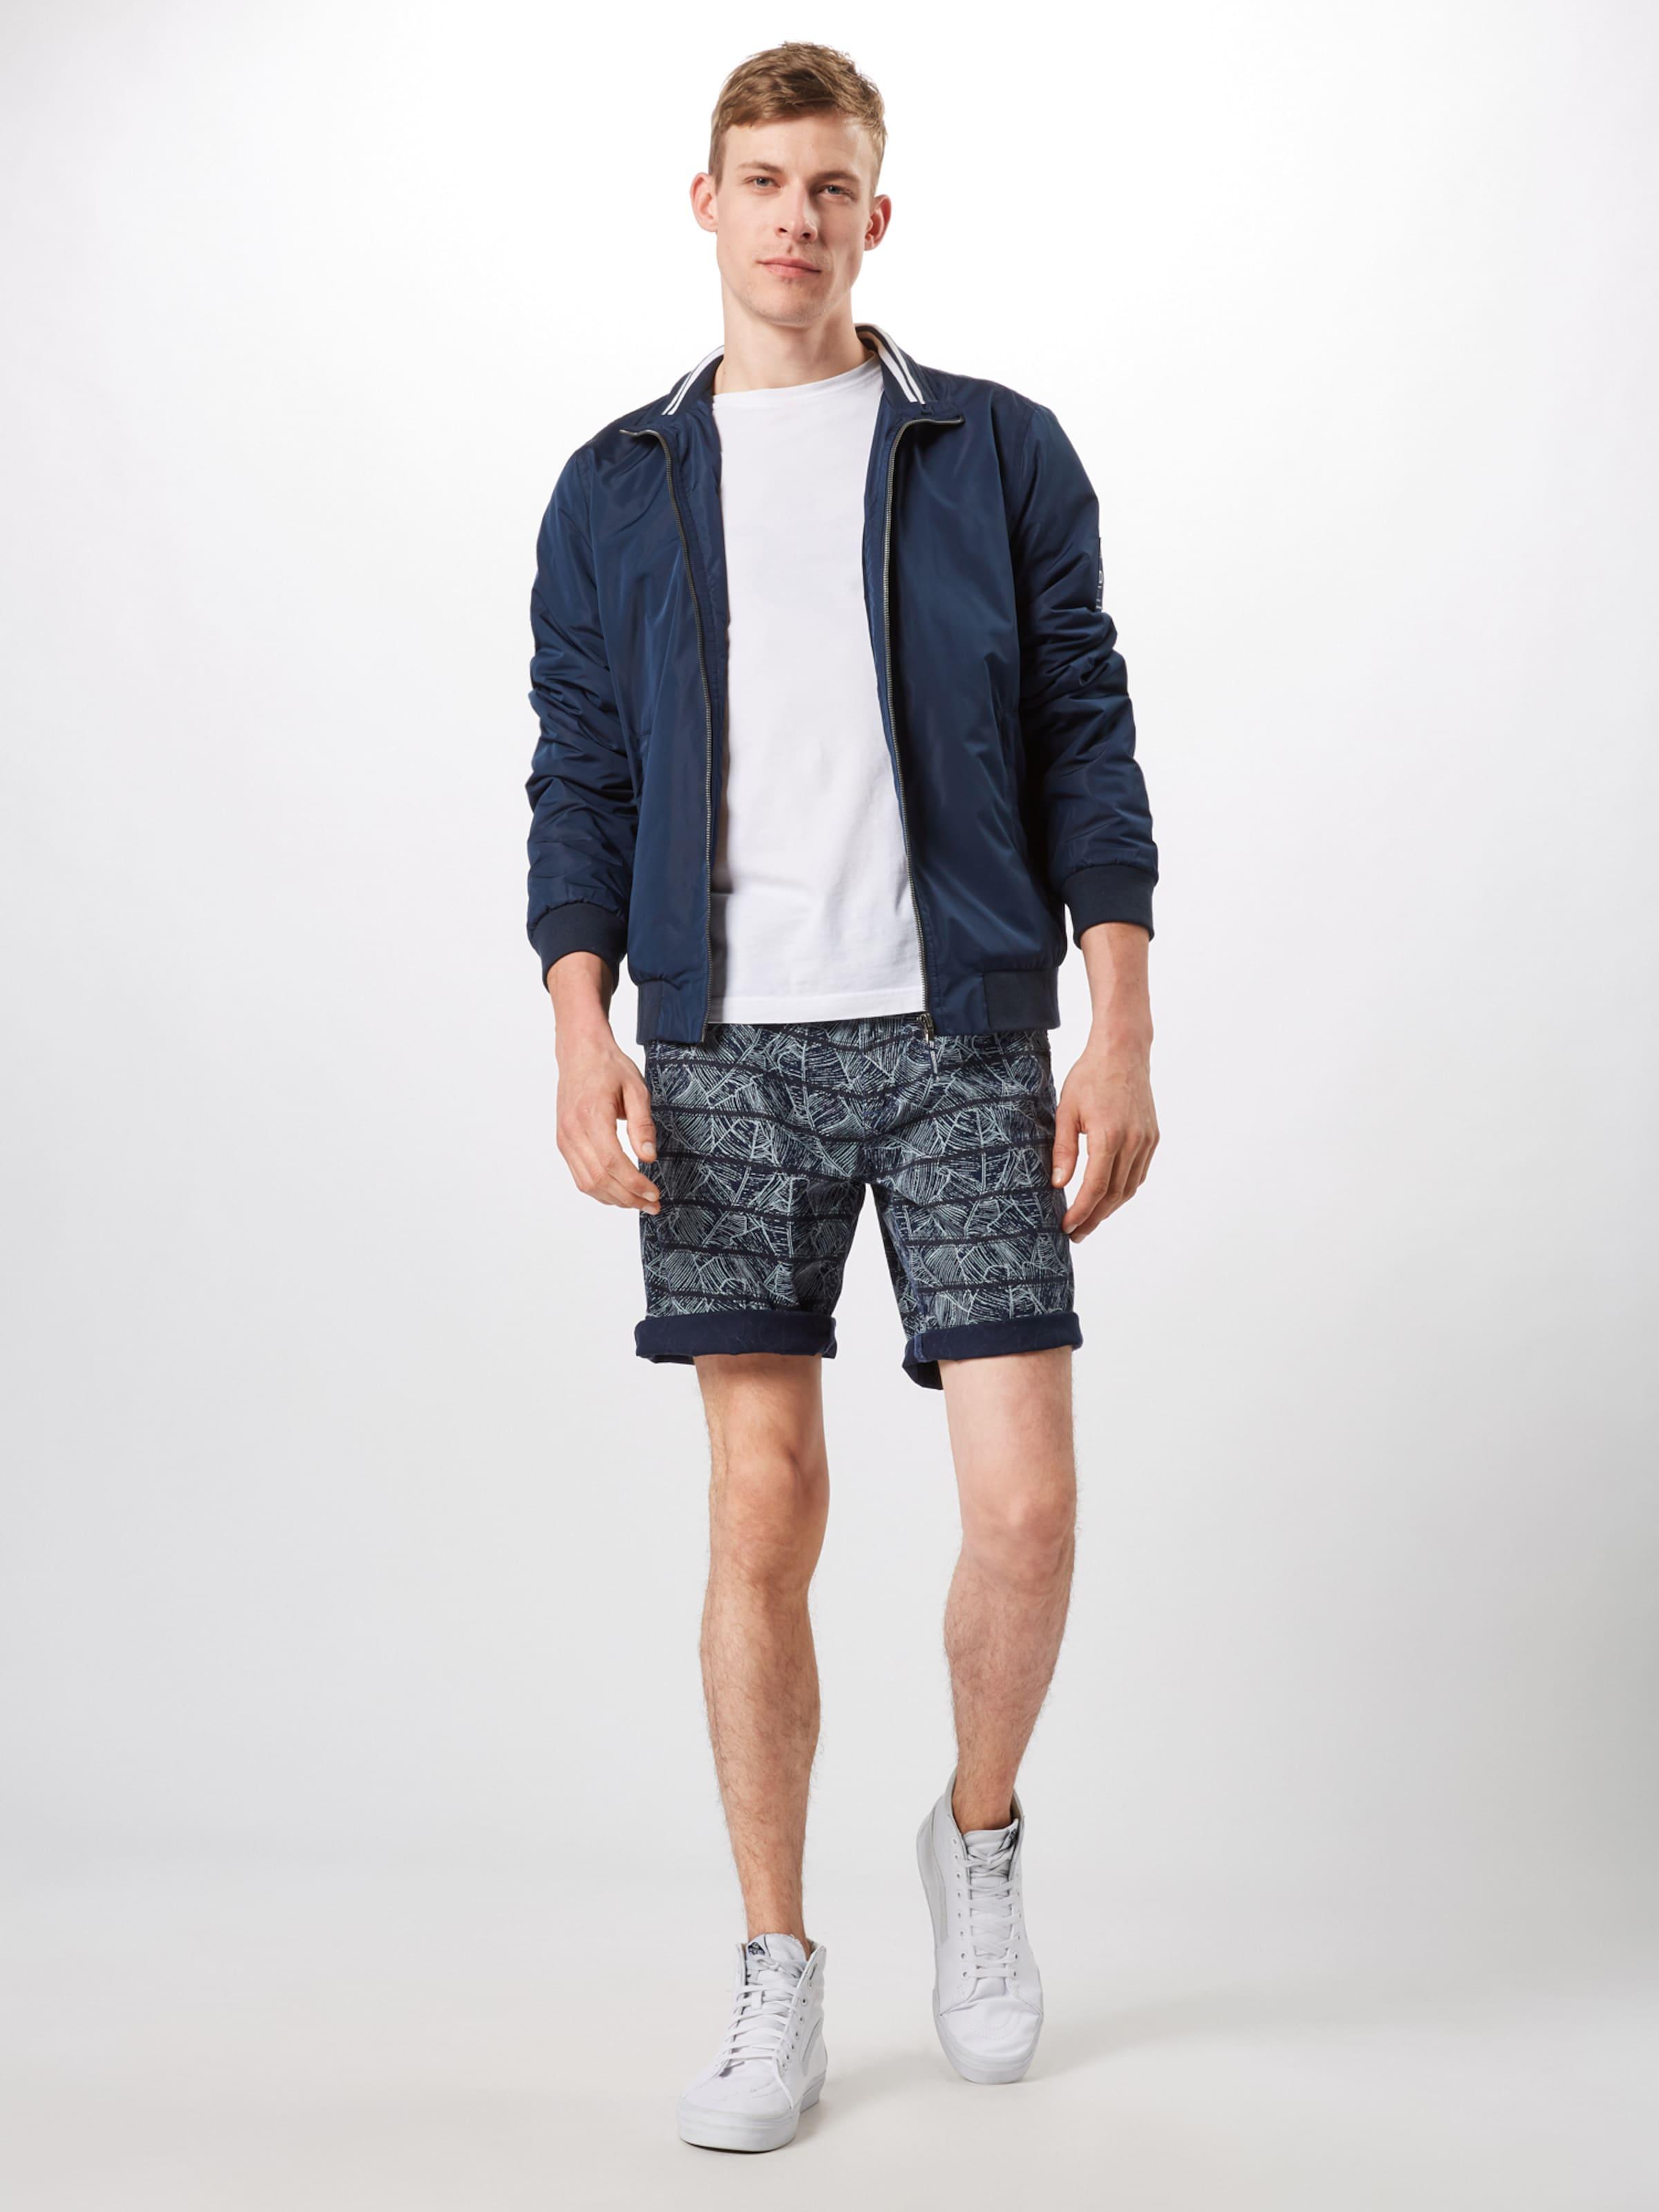 'plek' En Pantalon Marine S Red Bleu oliver Label tBhQsdxrC